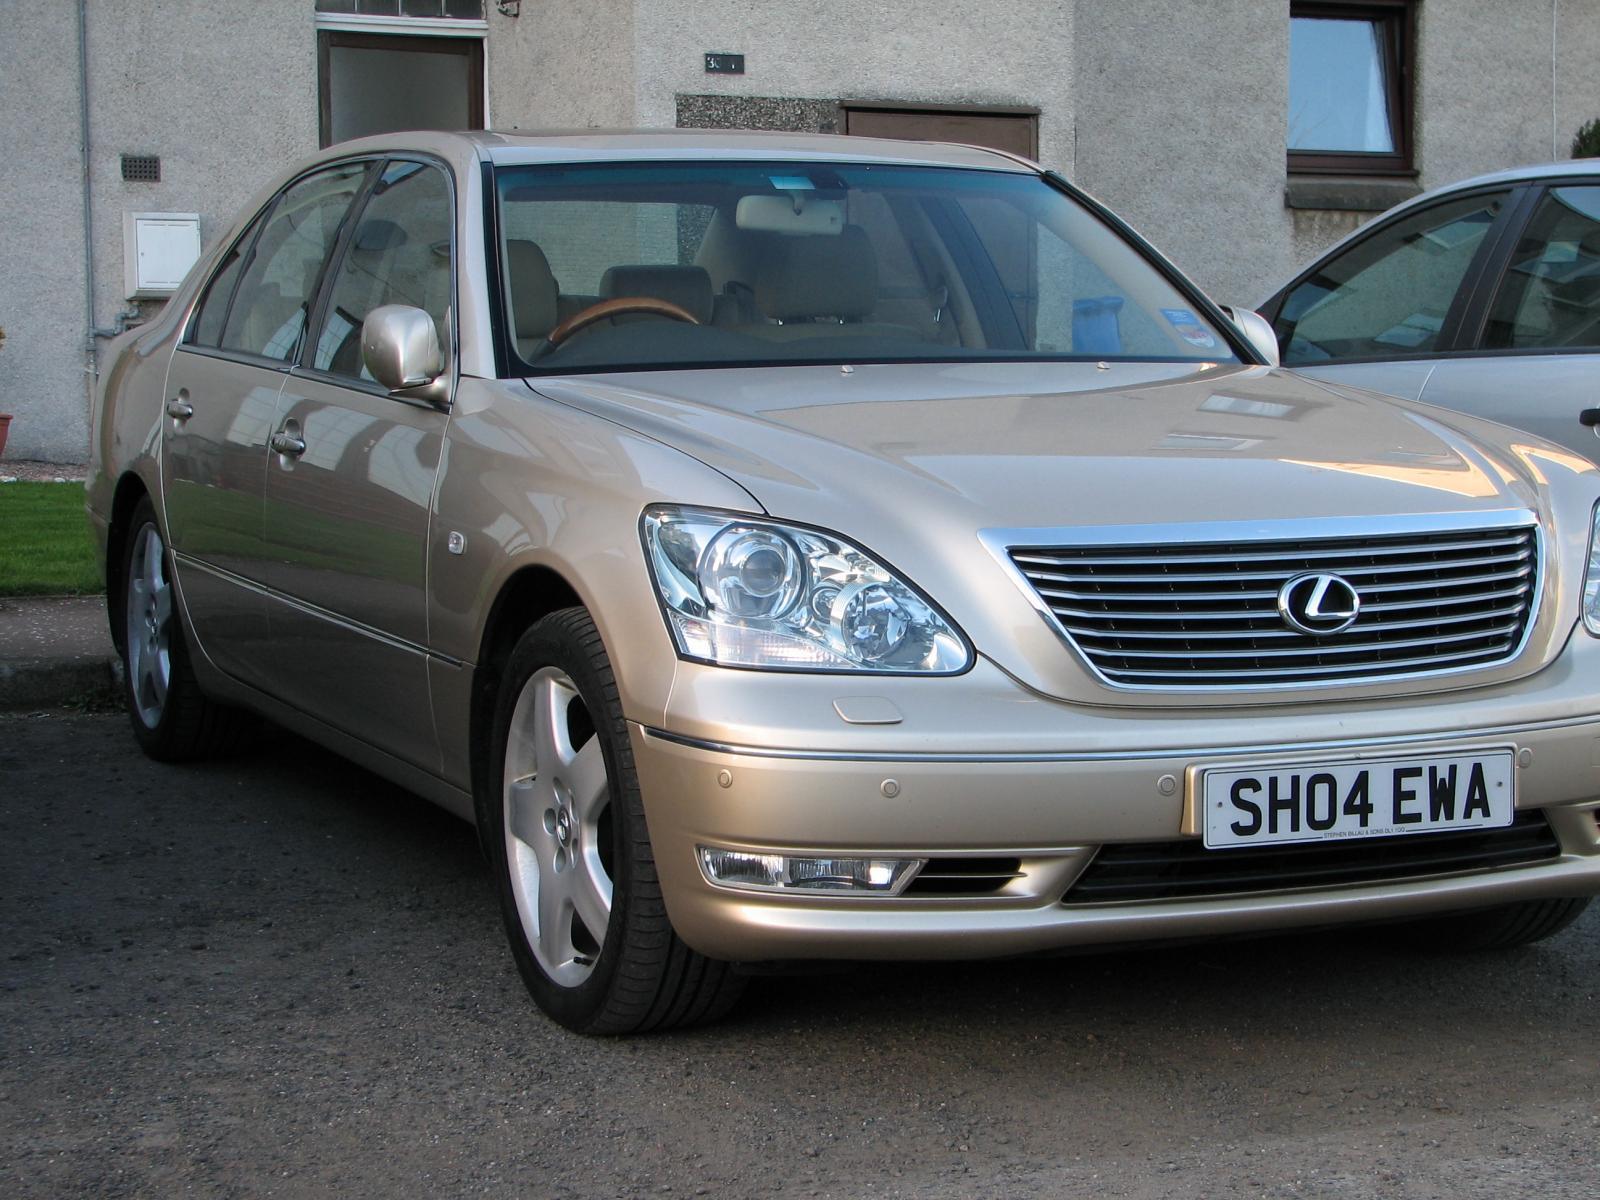 At Last I have my Lexus